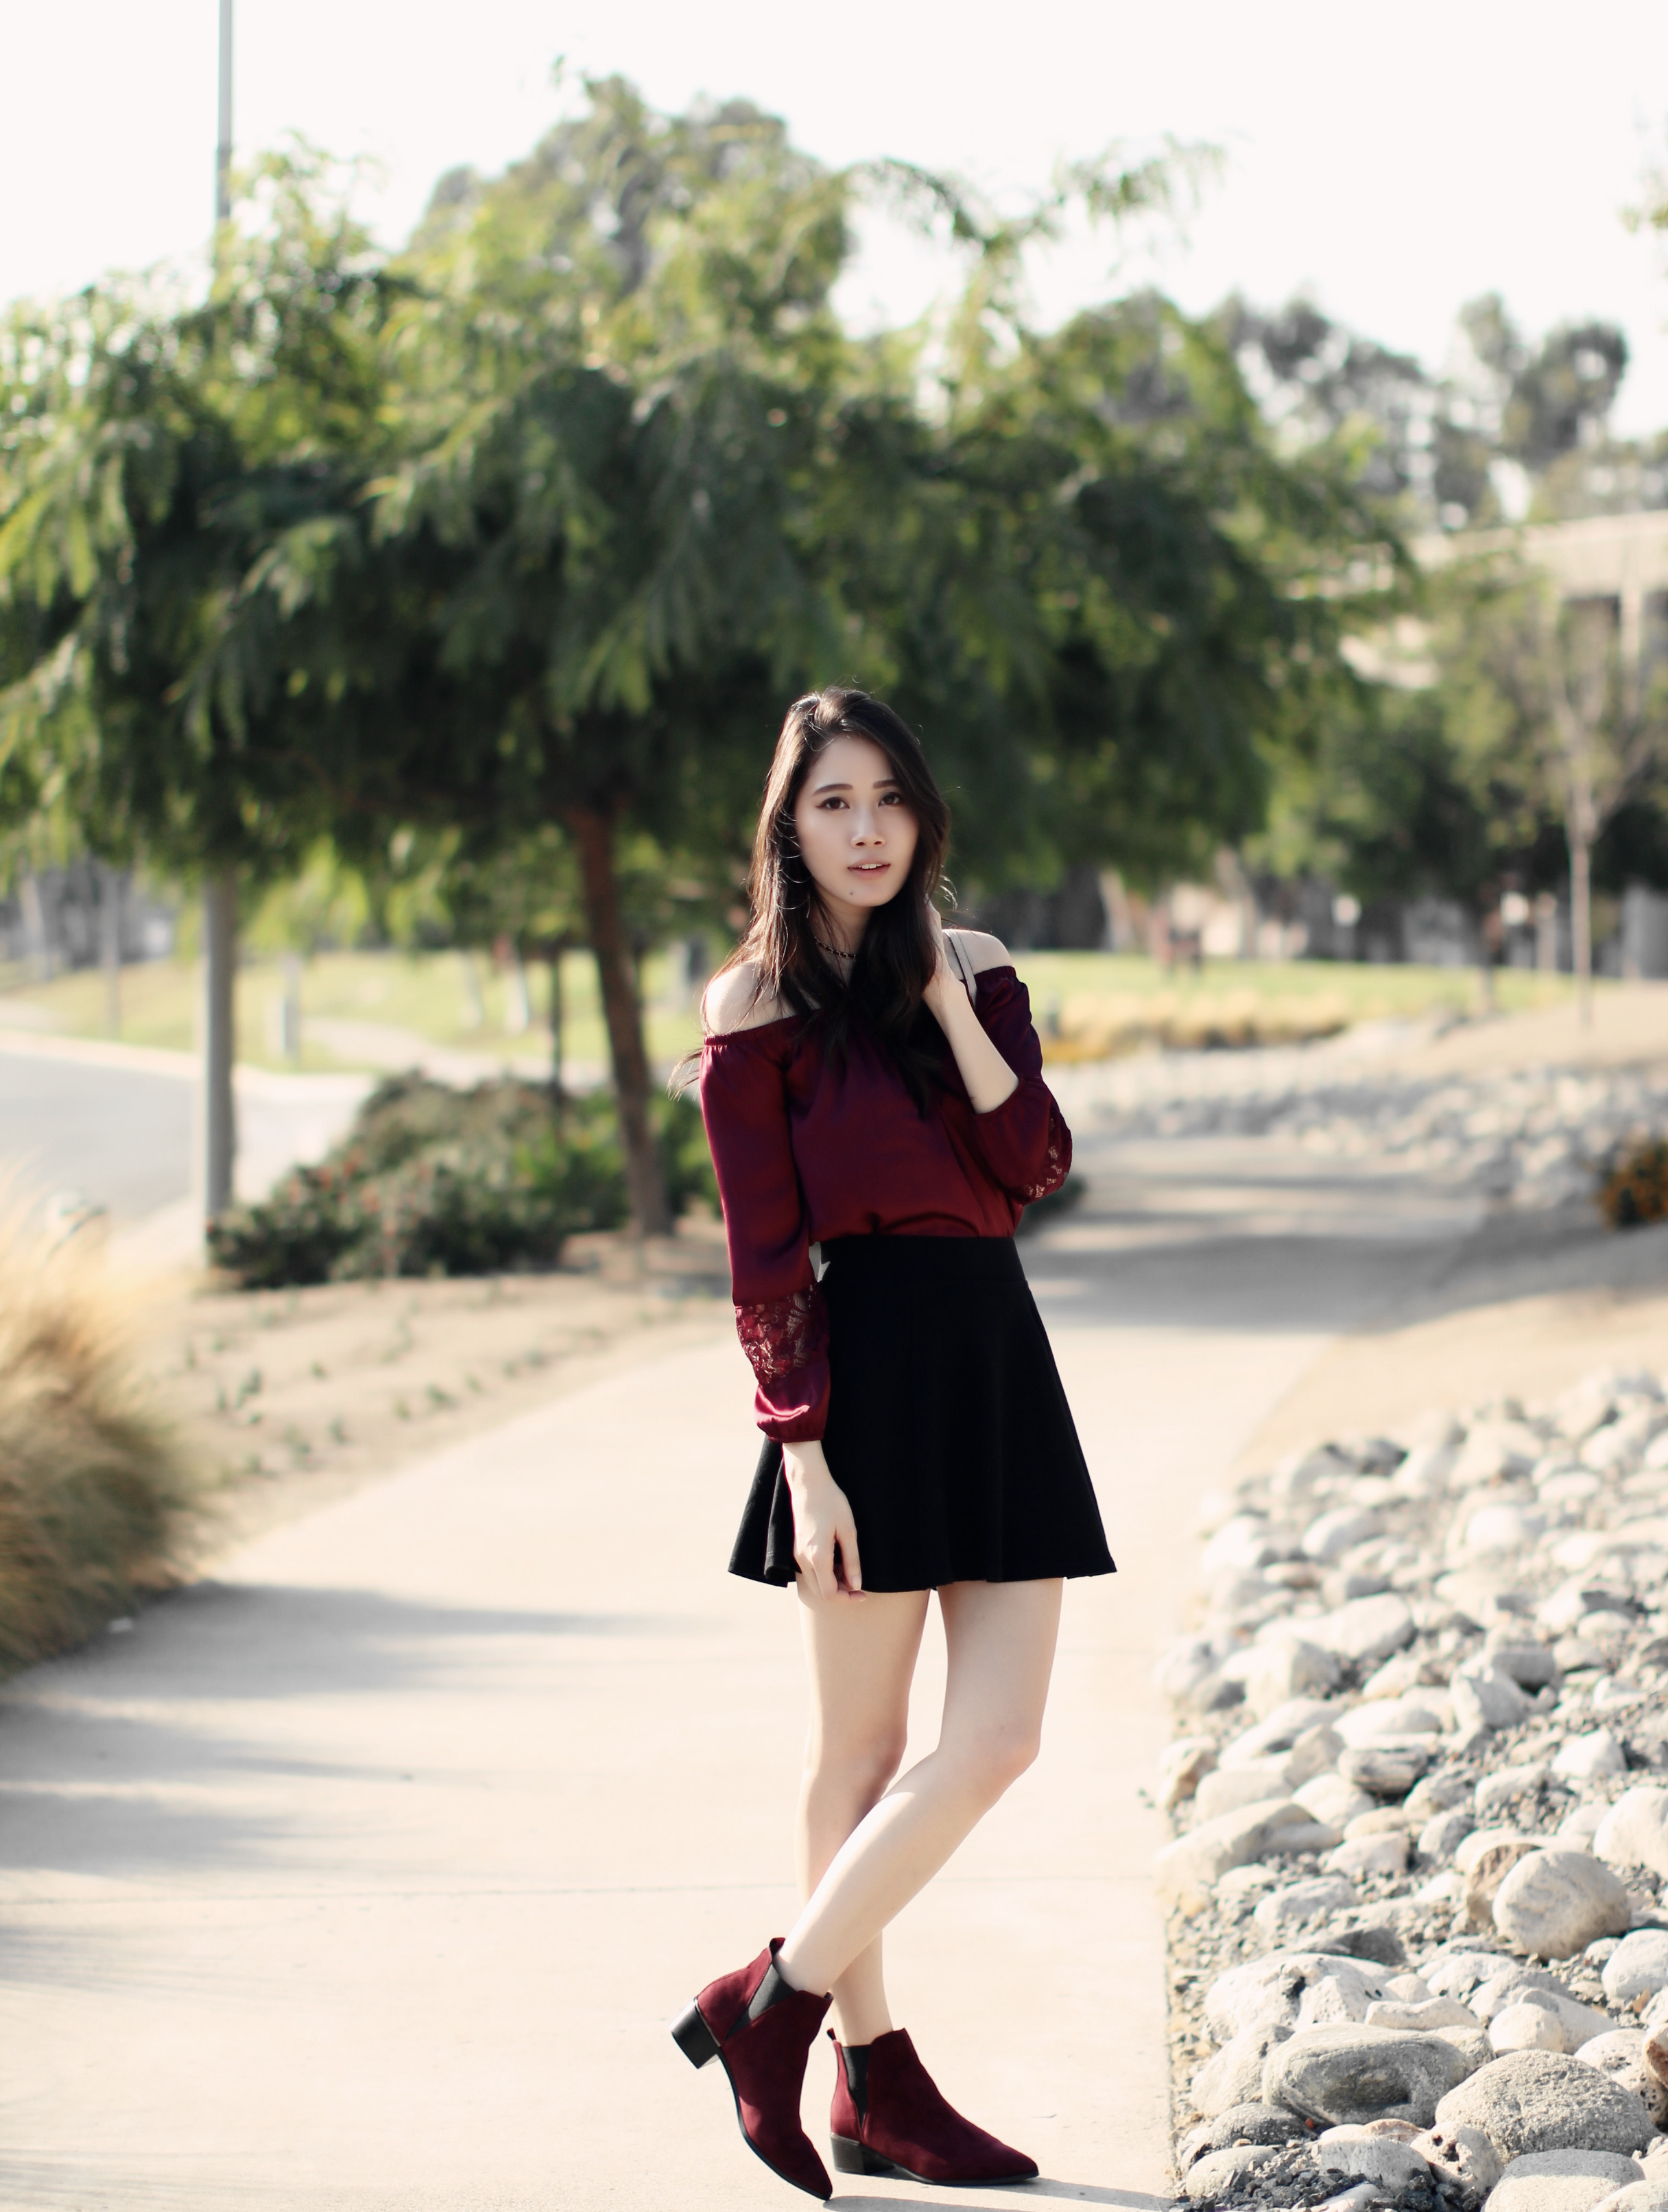 3584-ootd-fashion-style-outfitoftheday-wiwt-silk-lace-fallfashion-forever21-f21xme-elizabeeetht-clothestoyouuu